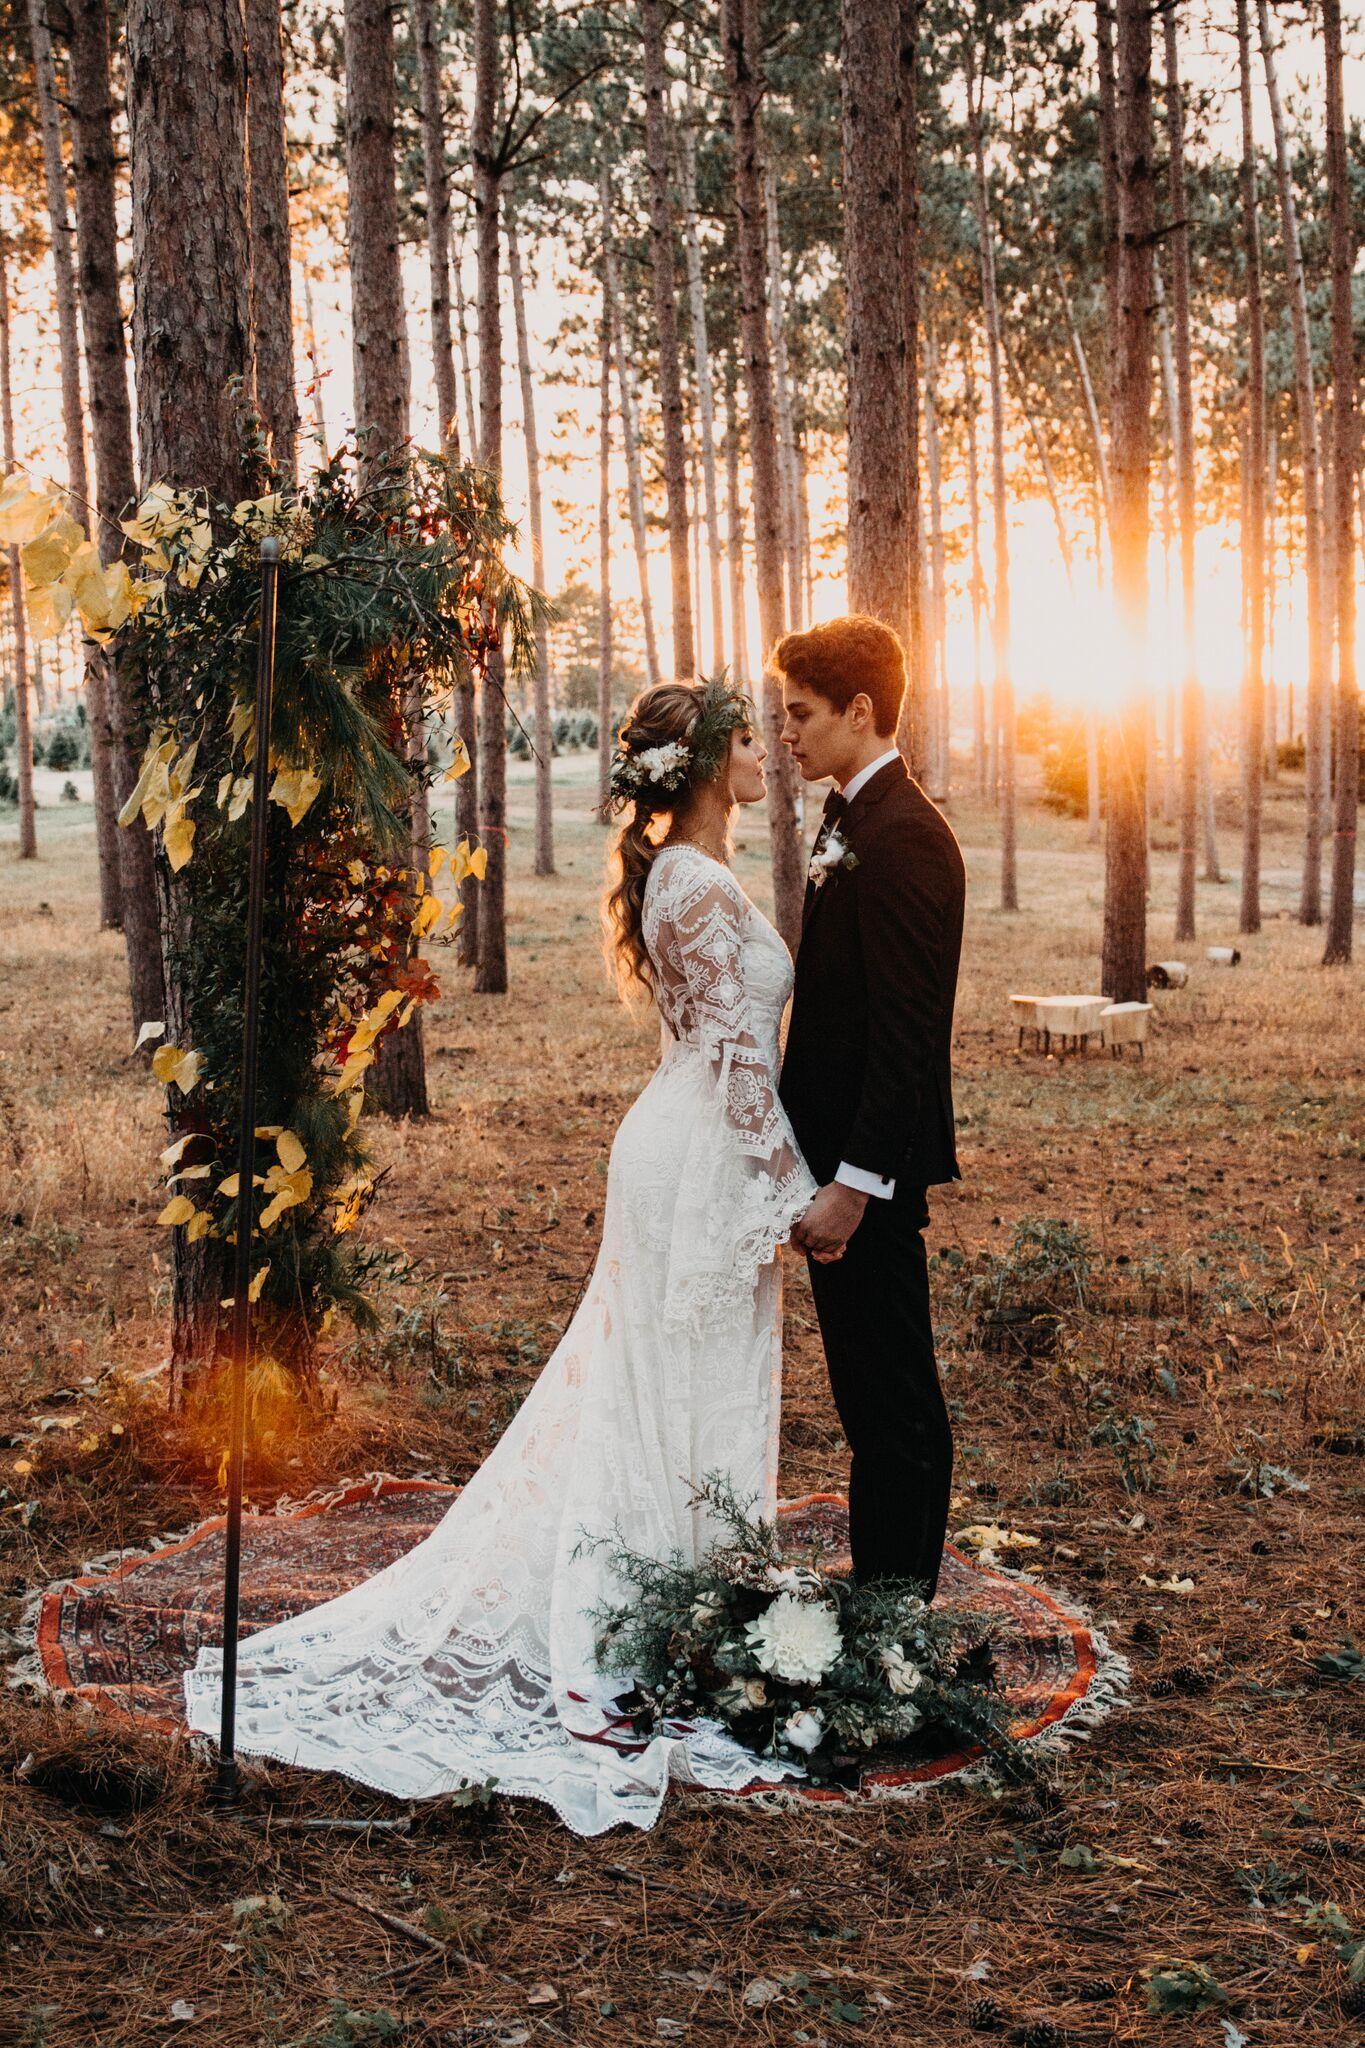 Woodsy Forest Foliage Wedding Altar Ceremony Pnw